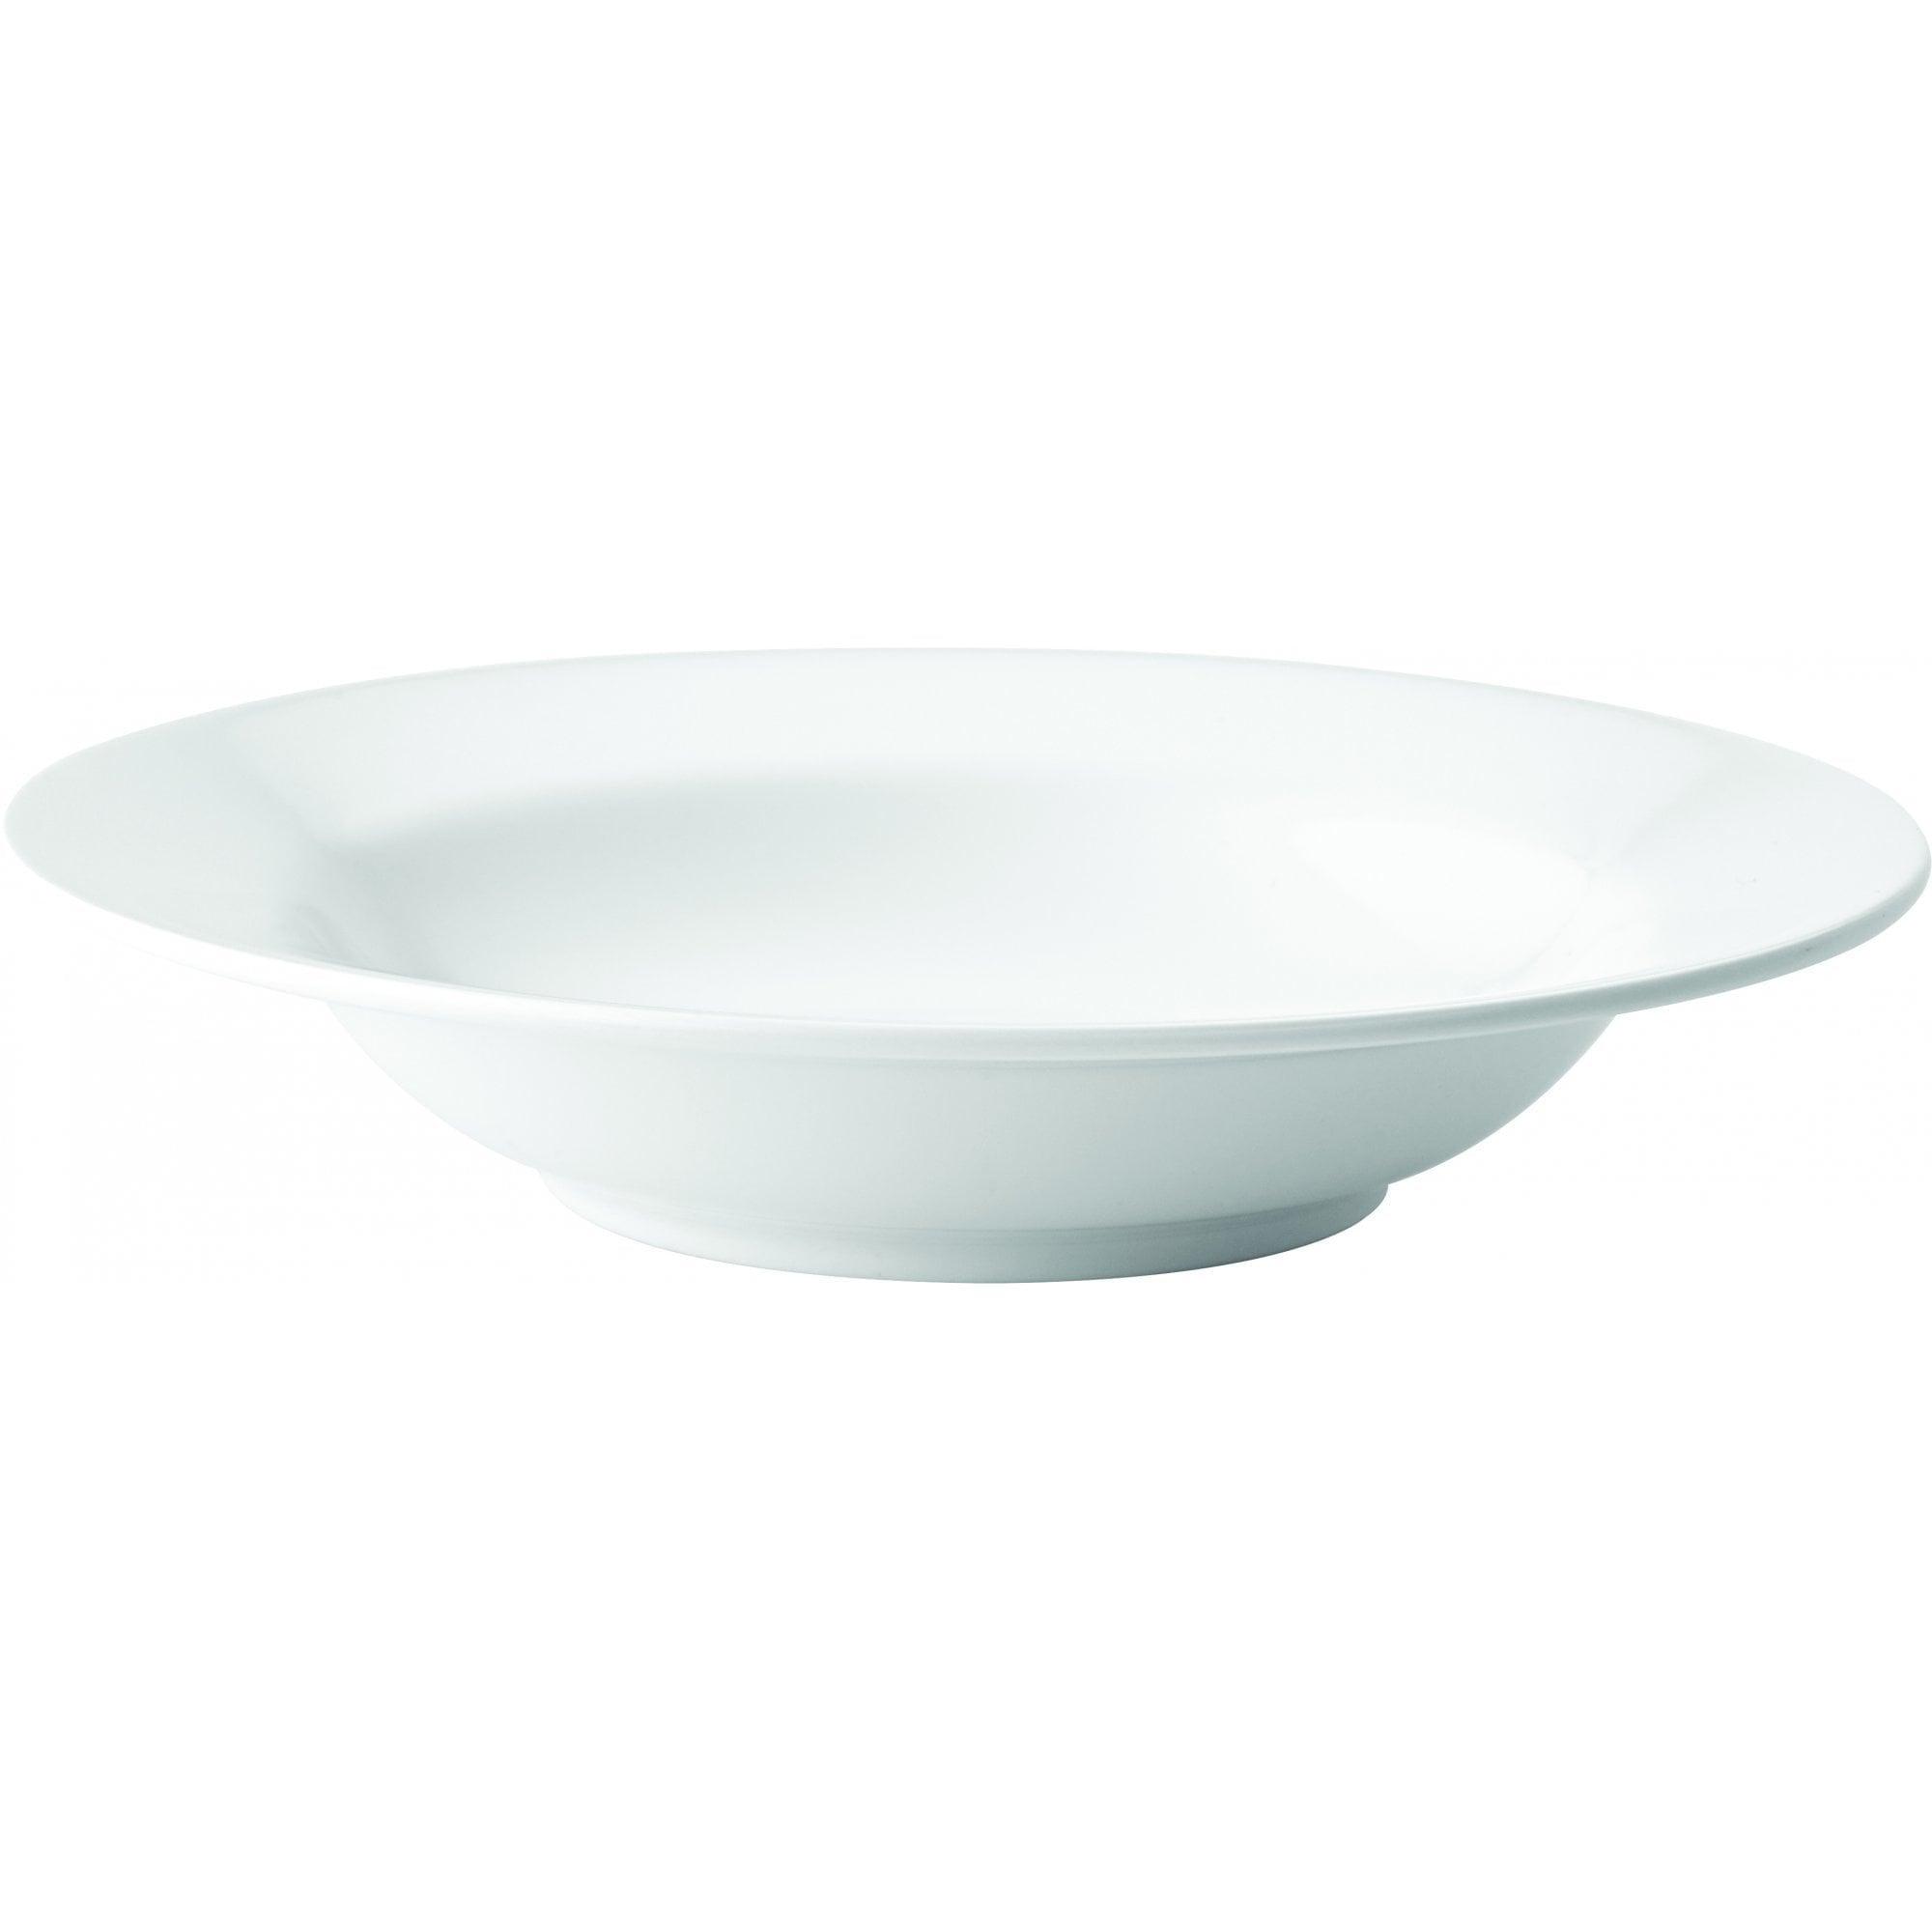 "12 x Kingline White Melamine Pasta Bowl 7.75/"" 19.5cm"